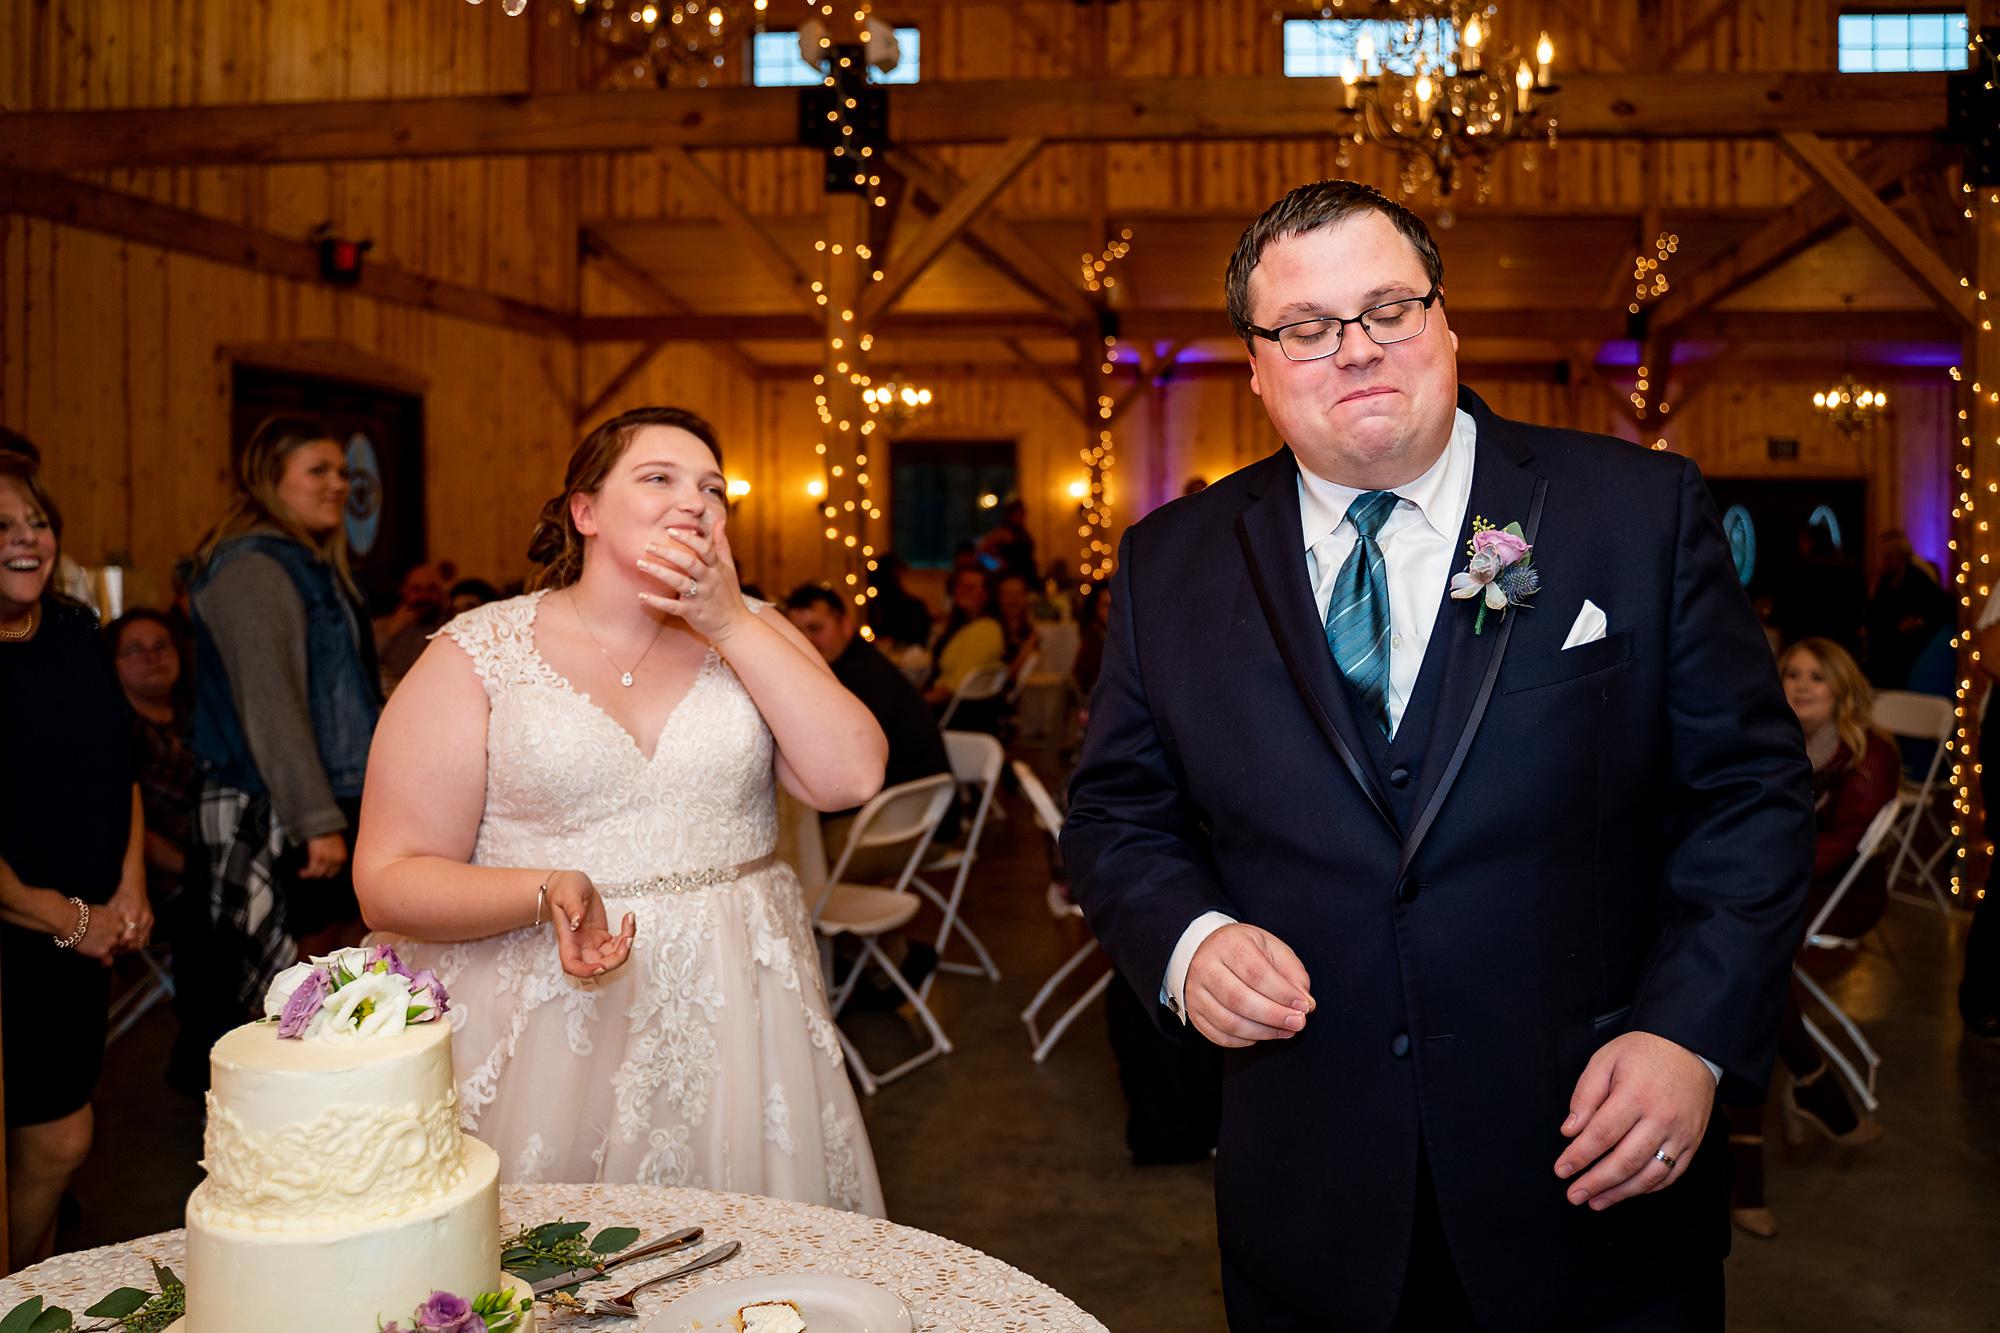 Silver-Creek-Stables-Wedding-Photography-20.jpg